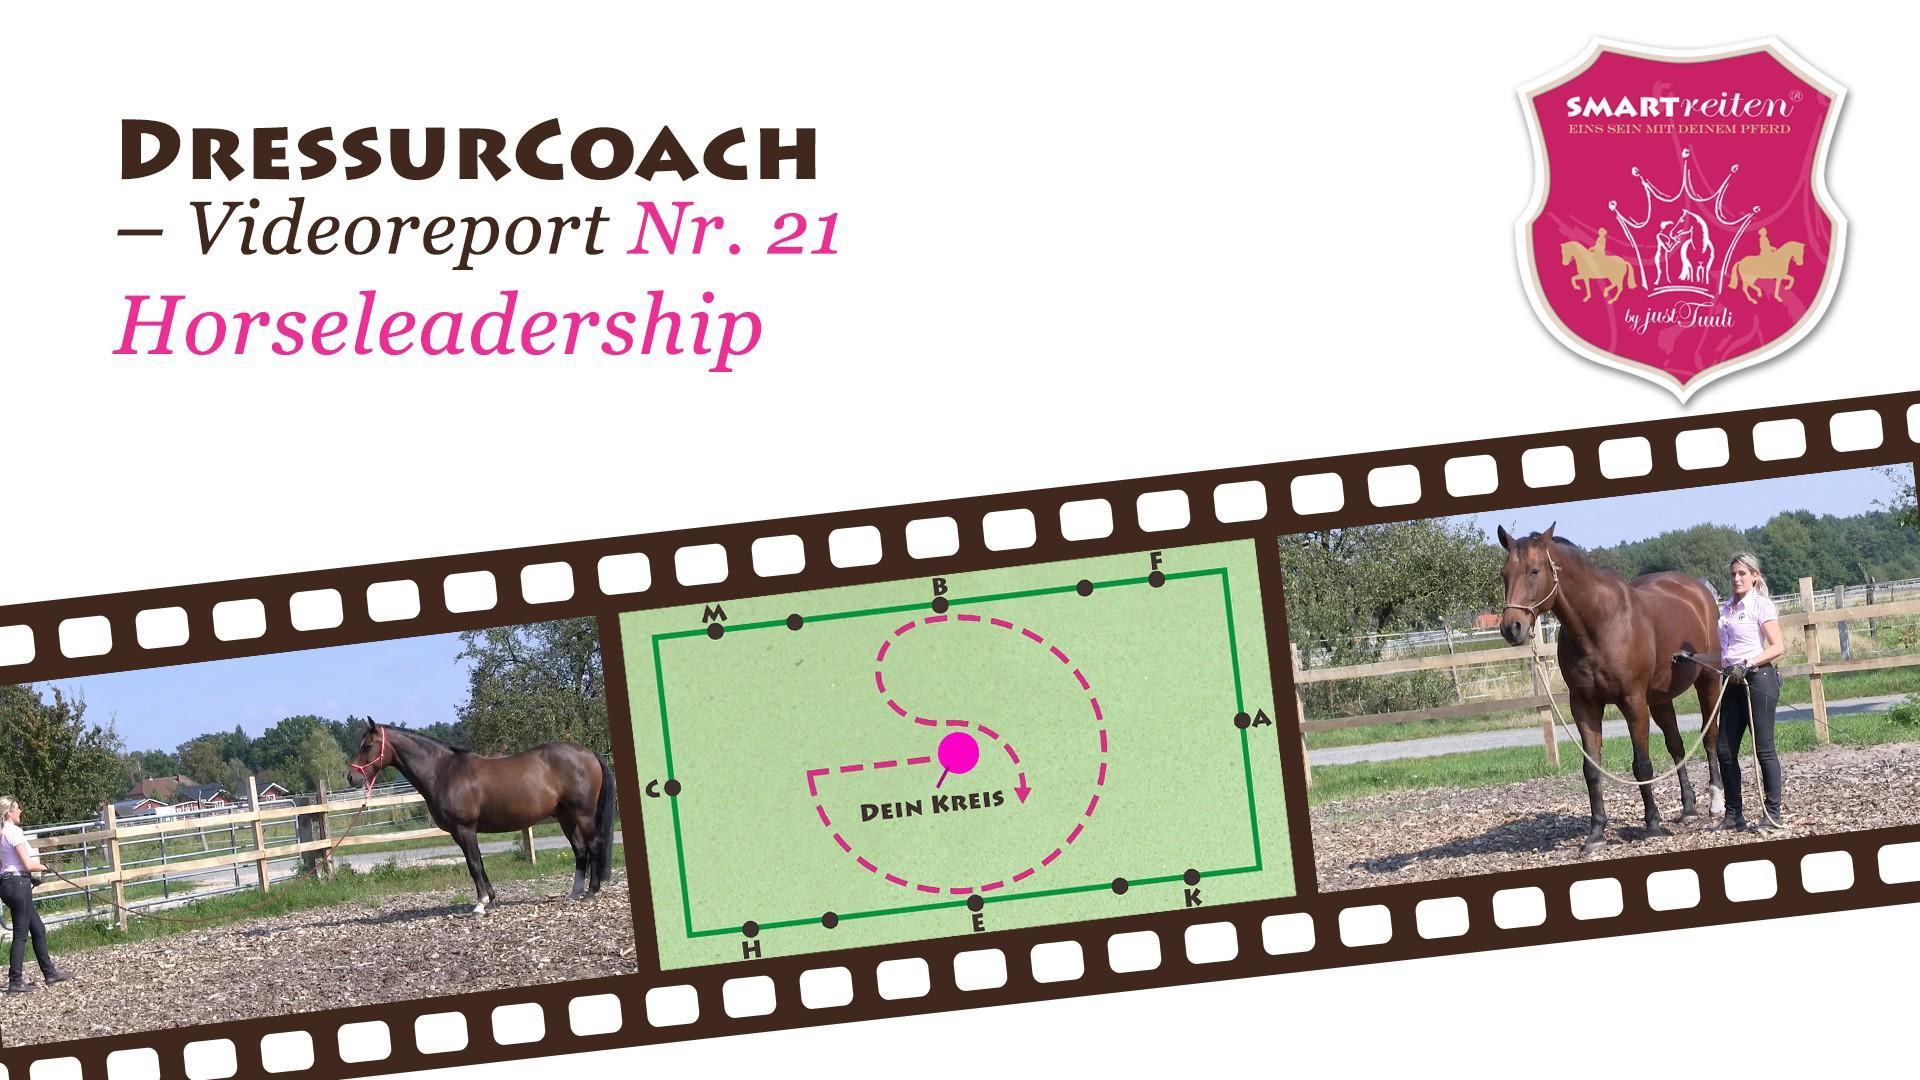 Horseleadership